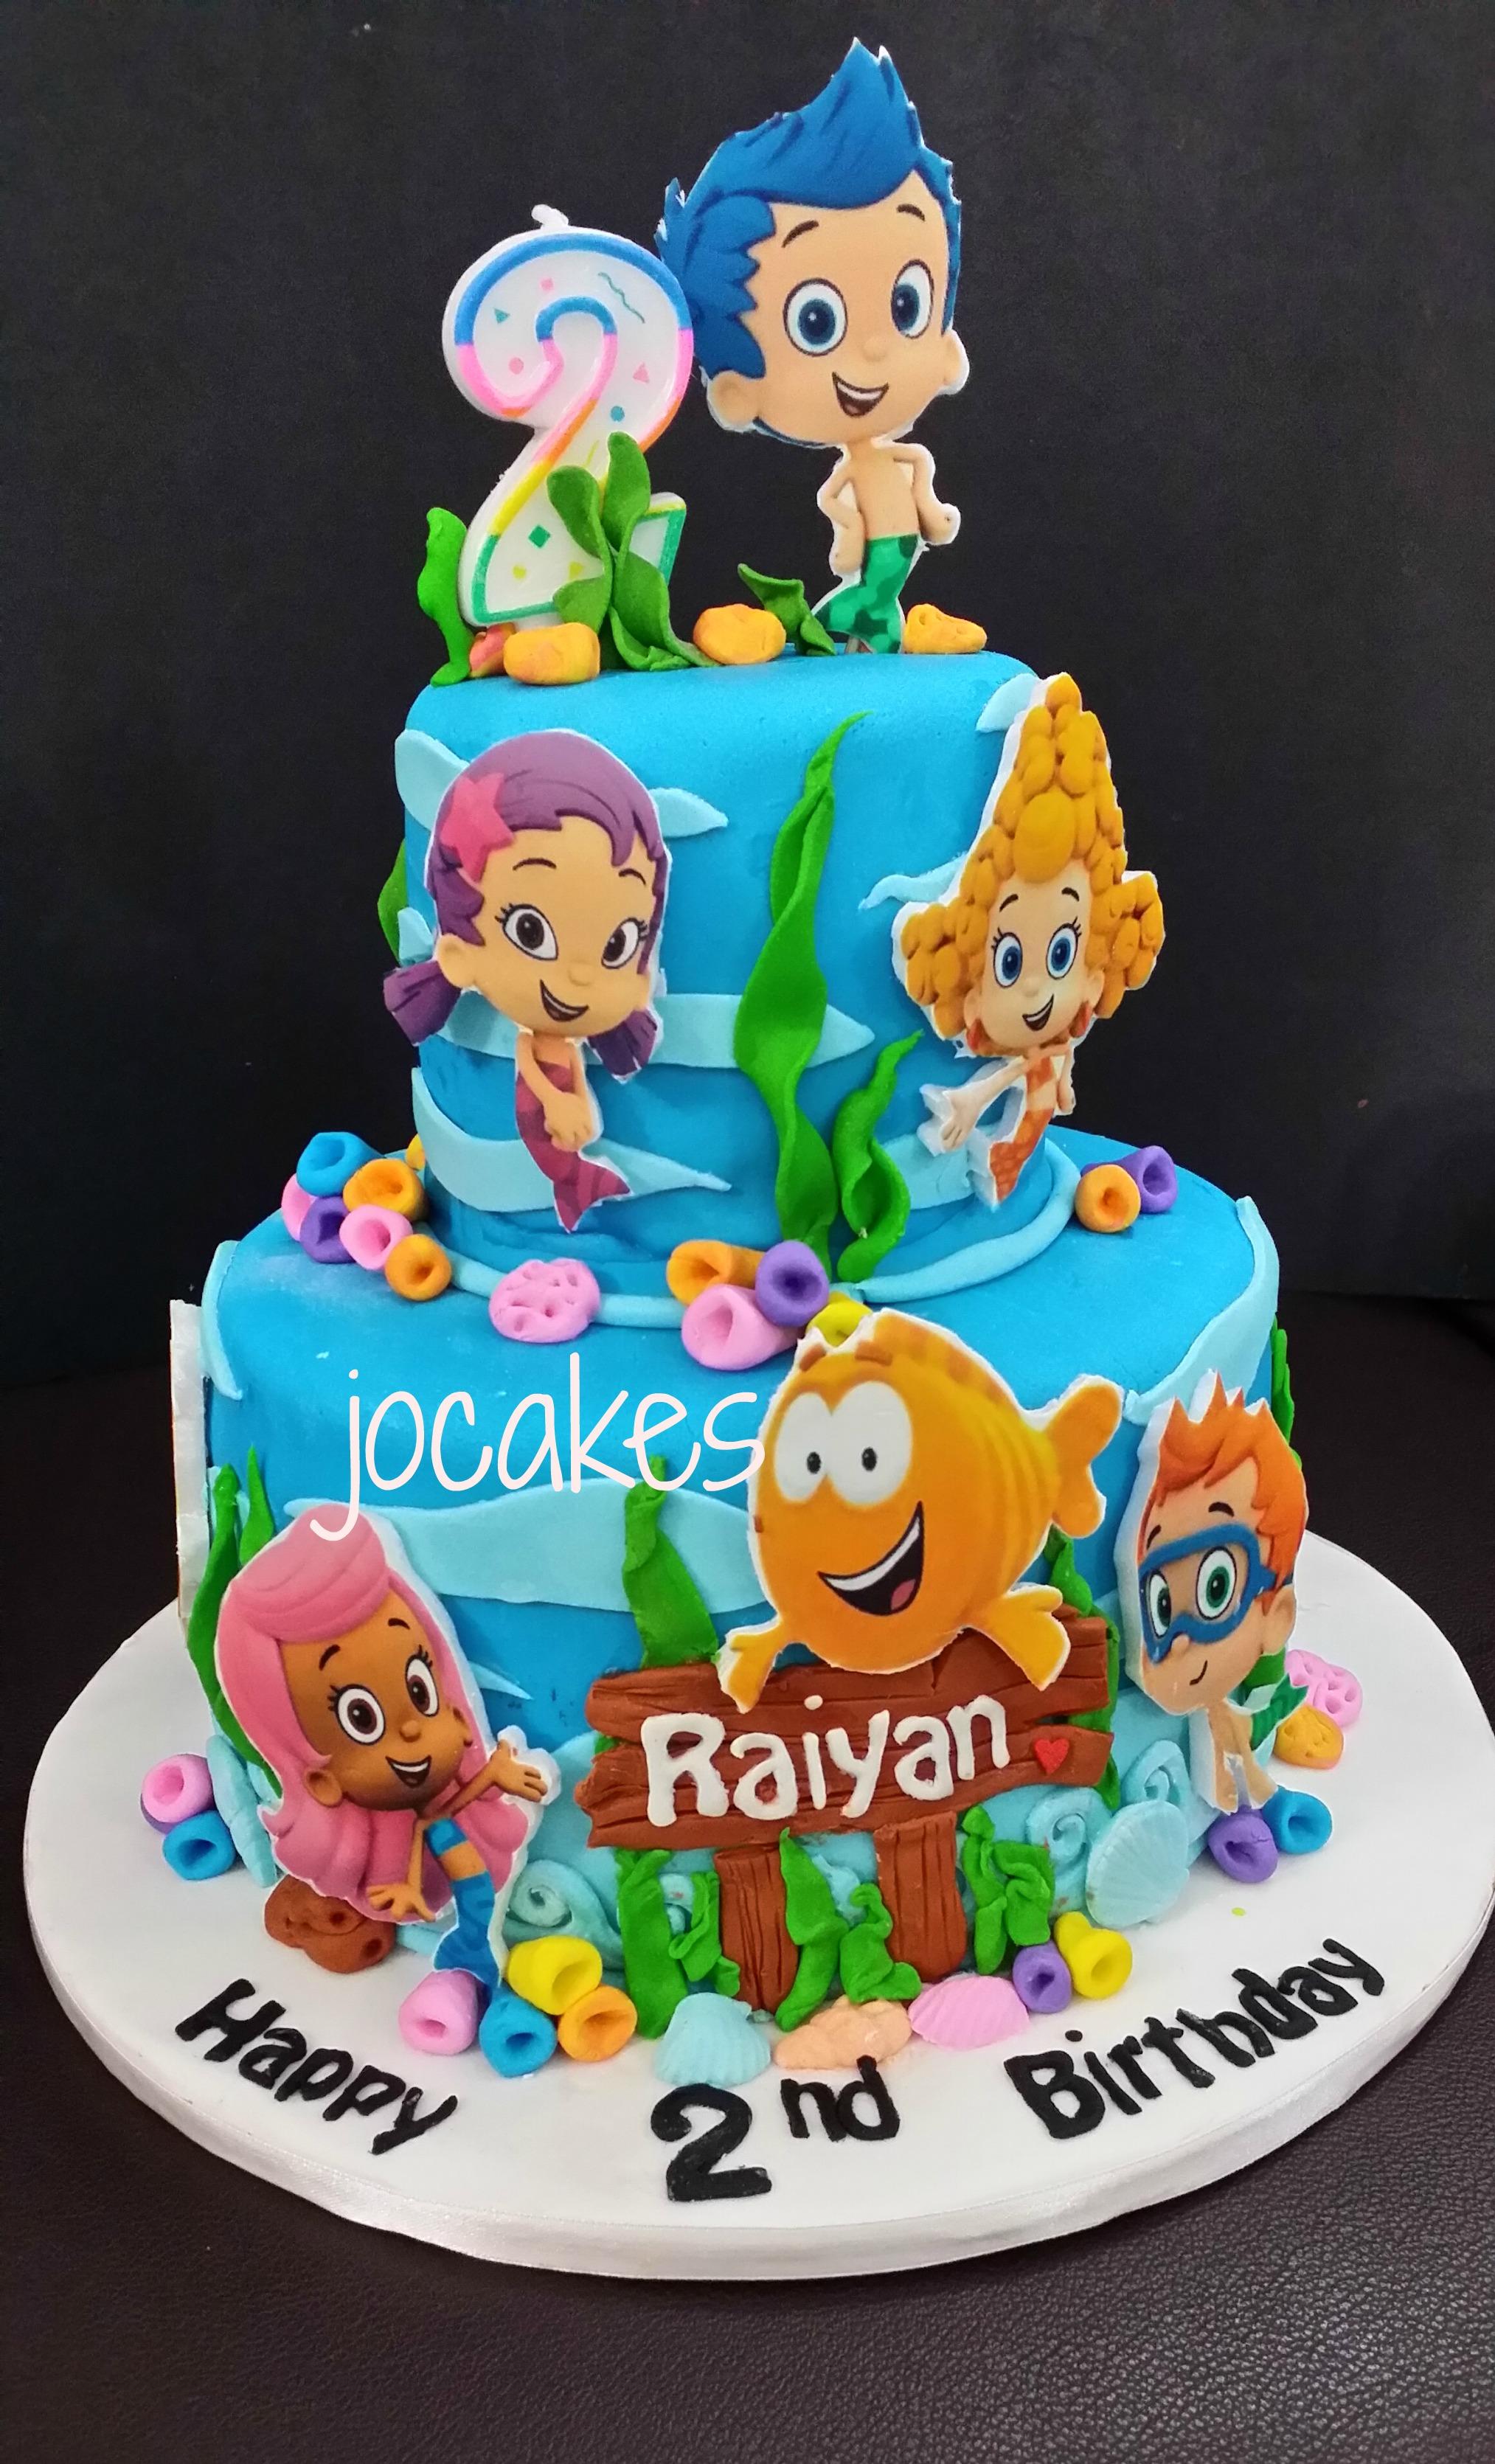 Enjoyable 12 Bubble Guppies Who Makes Cakes Photo Bubble Guppies Cake Birthday Cards Printable Inklcafe Filternl